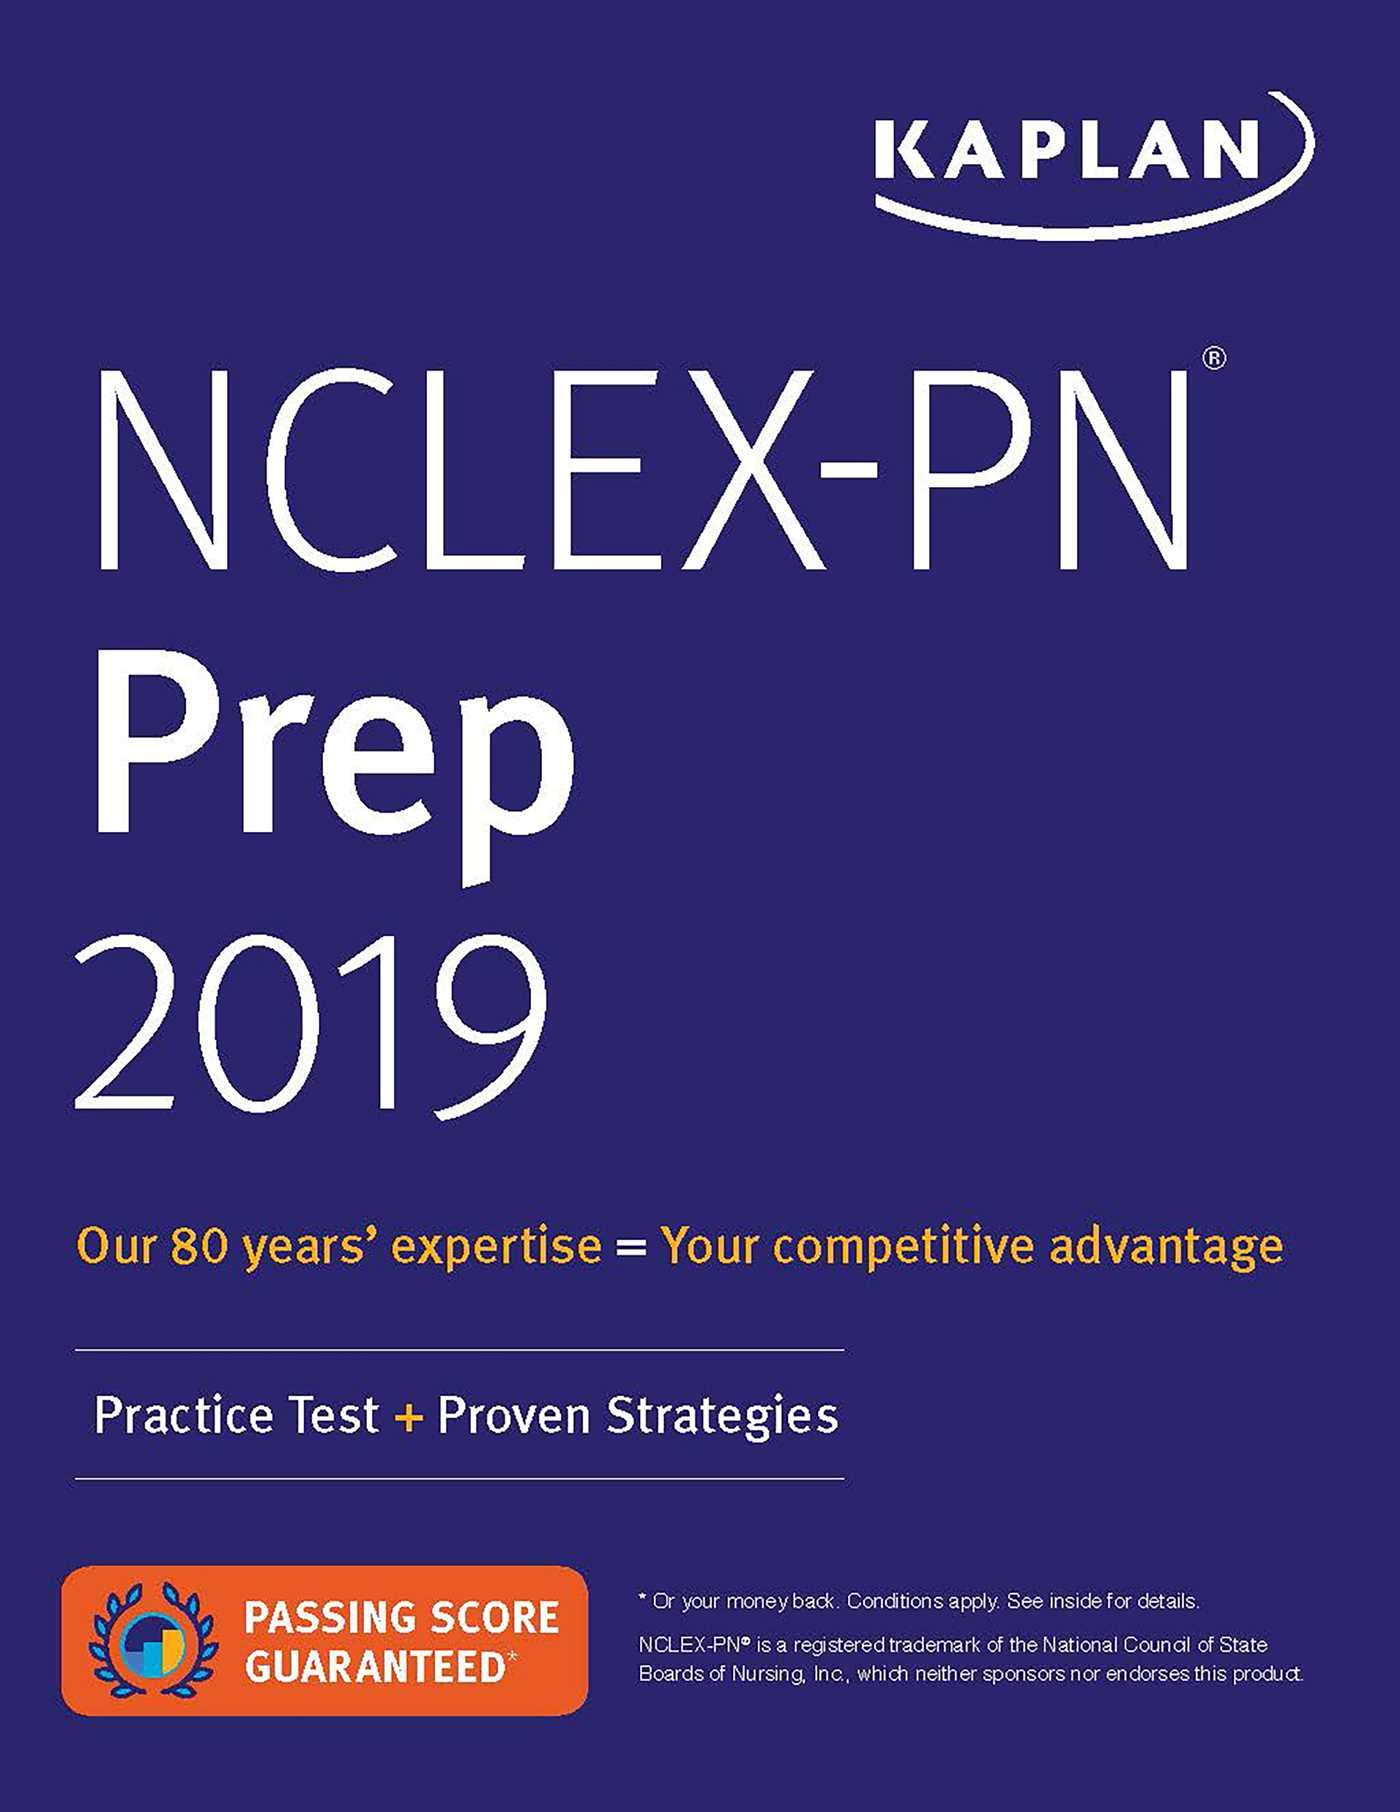 NCLEX PN Prep 2019  Practice Test + Proven Strategies  Kaplan Test Prep